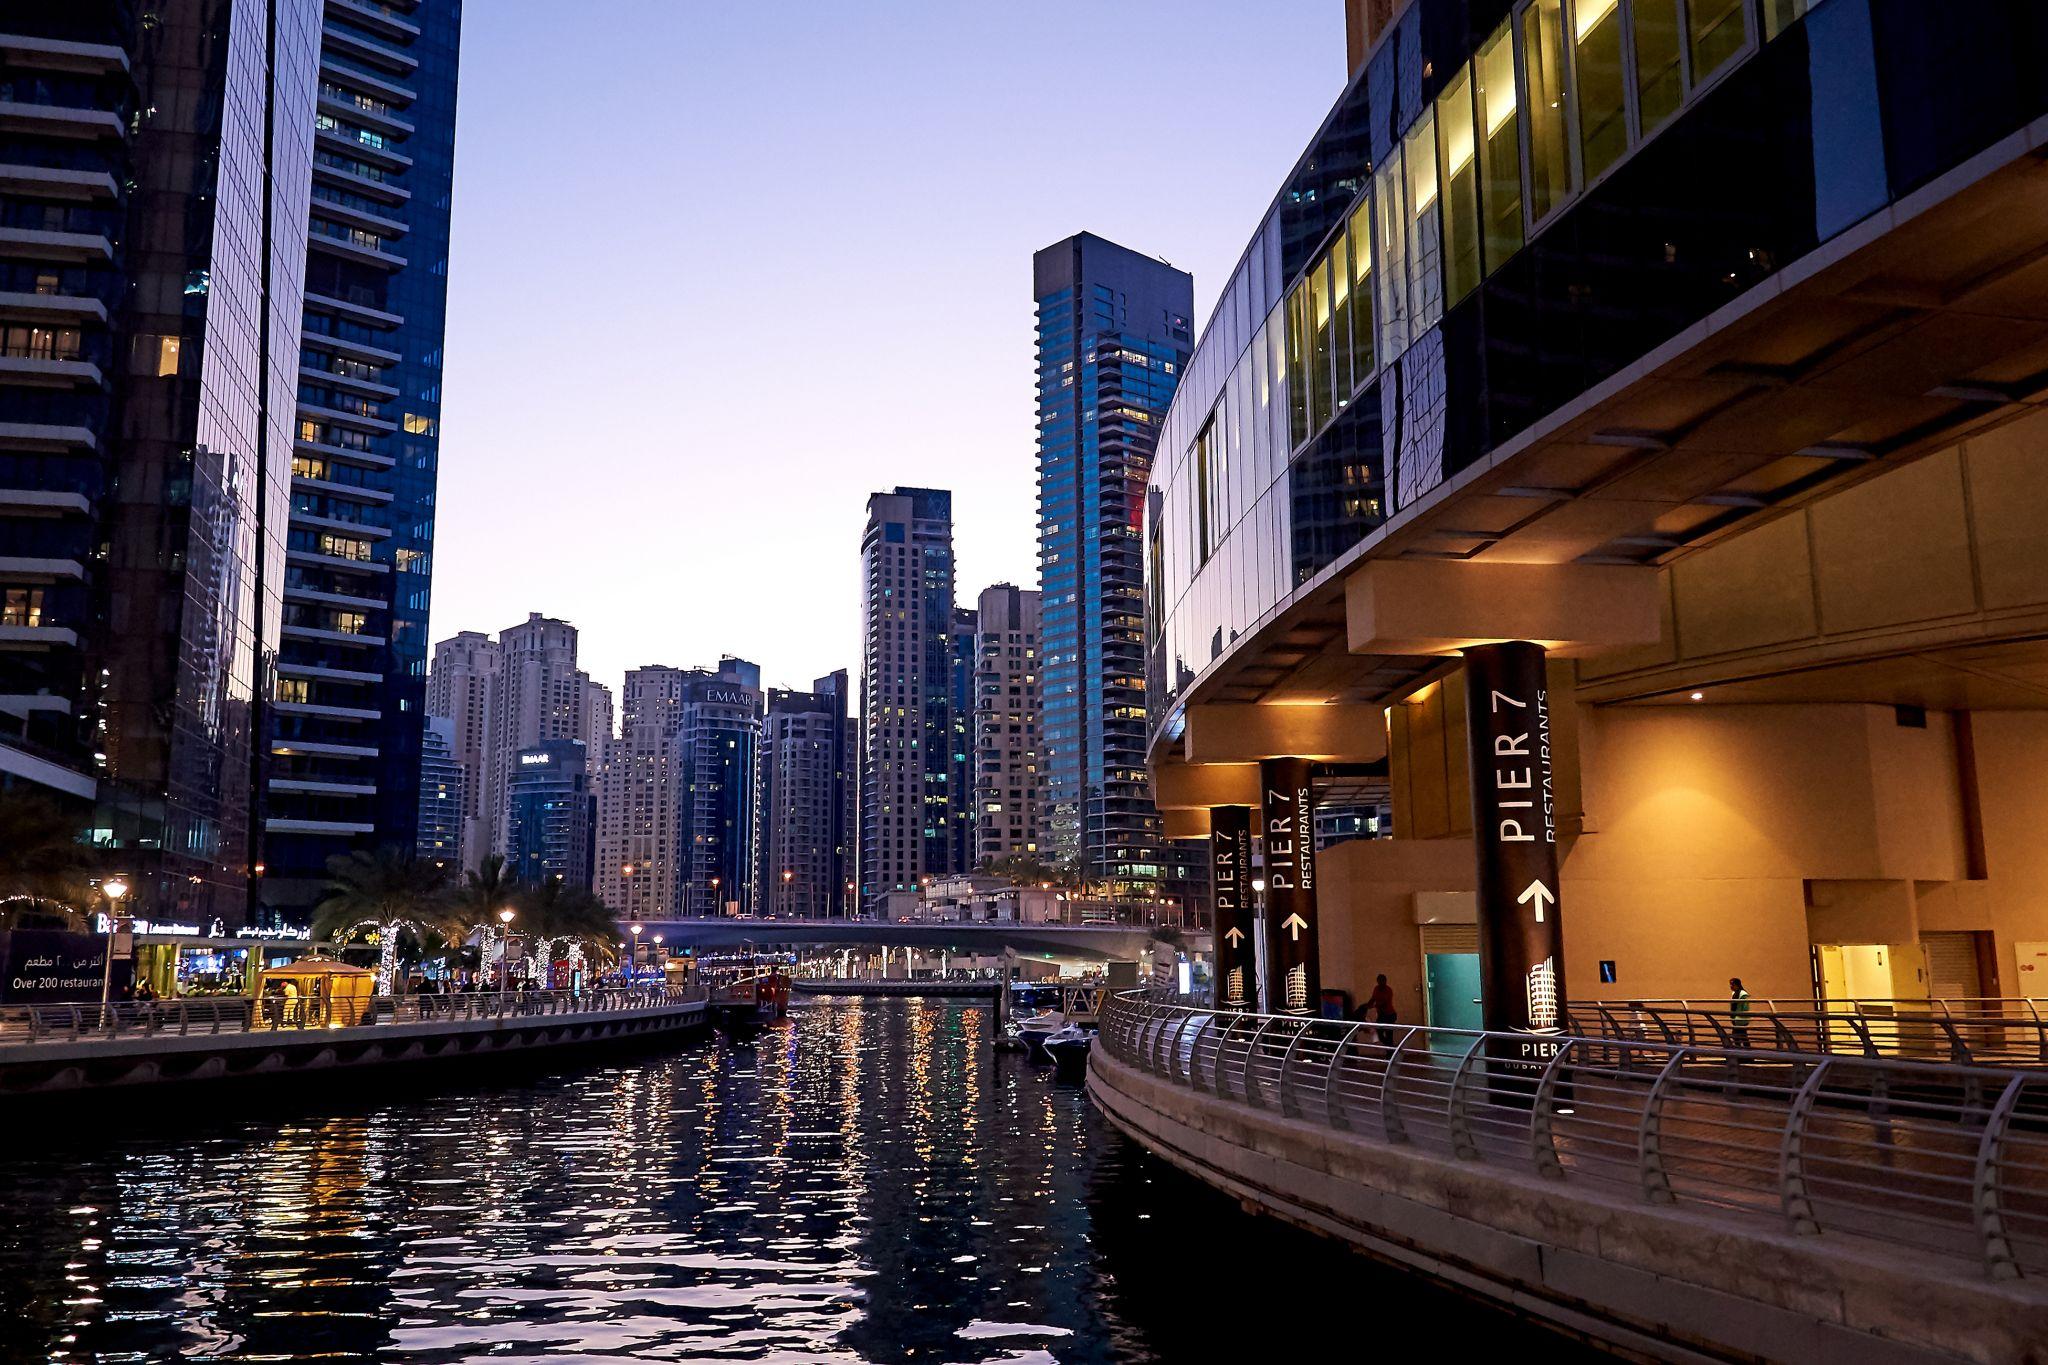 Dubai Marina Pier 7, United Arab Emirates